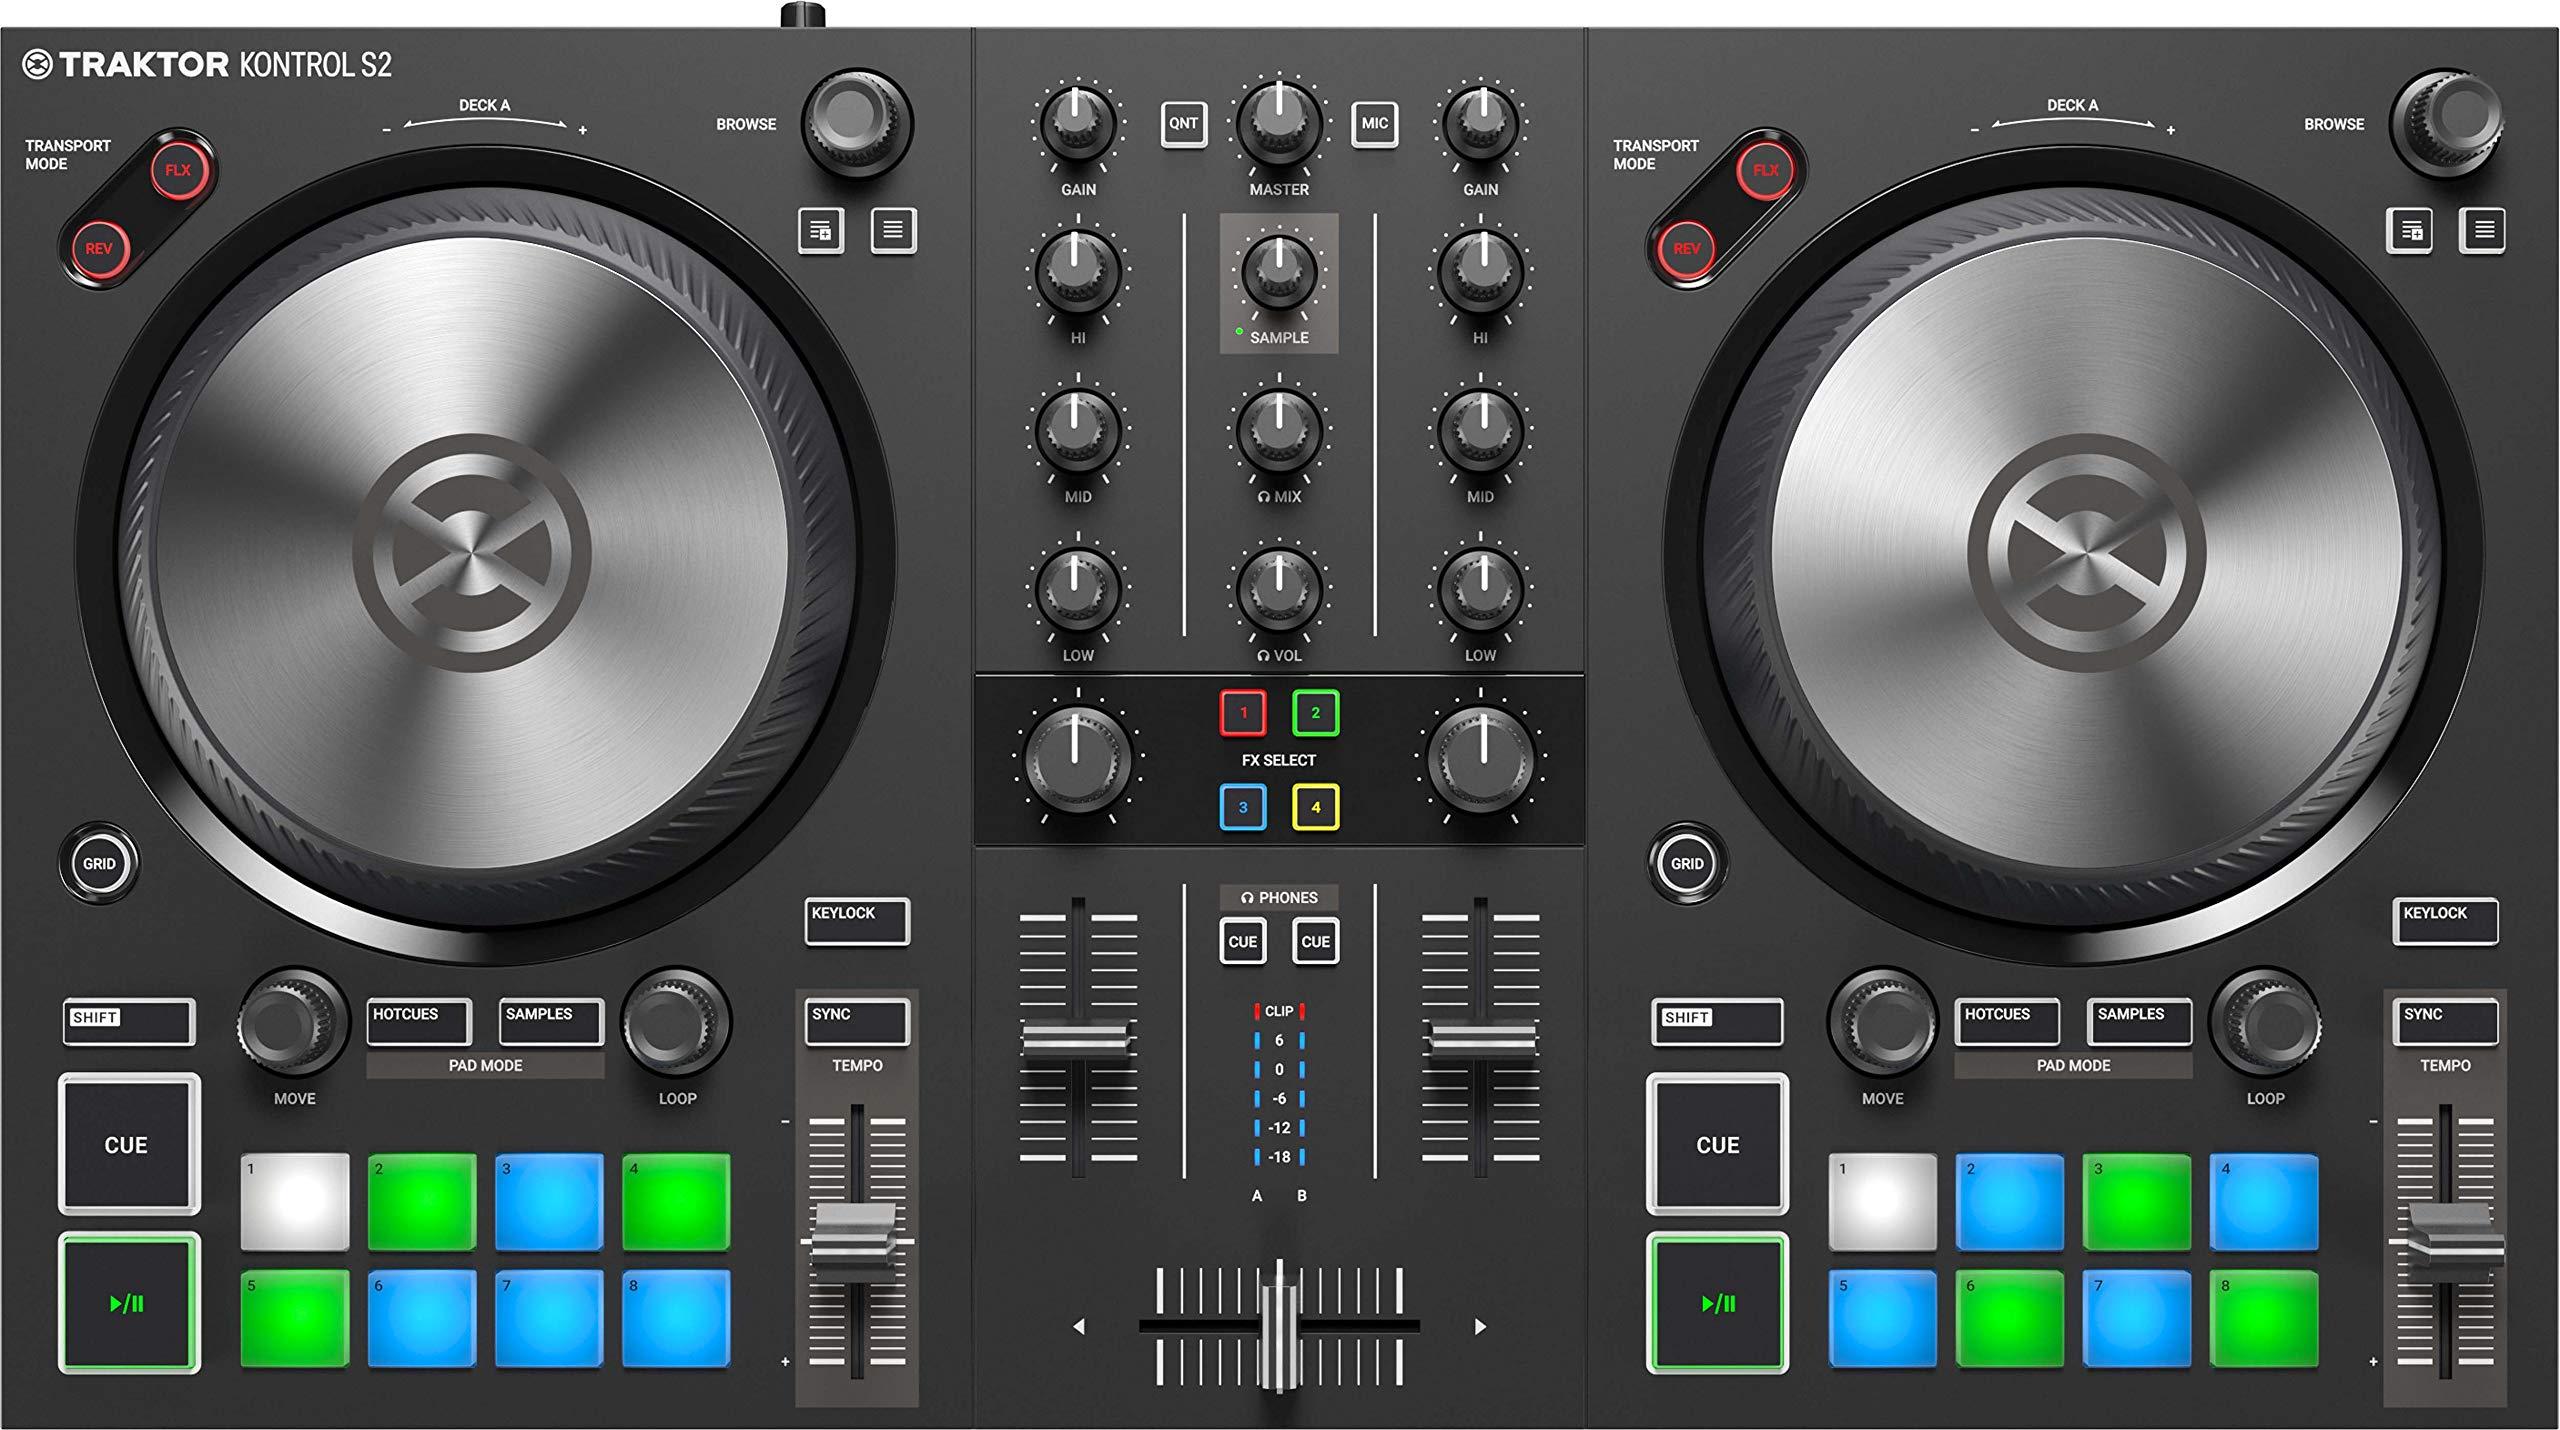 Native Instruments Traktor Kontrol S2 Mk3 DJ Controller by Native Instruments (Image #2)